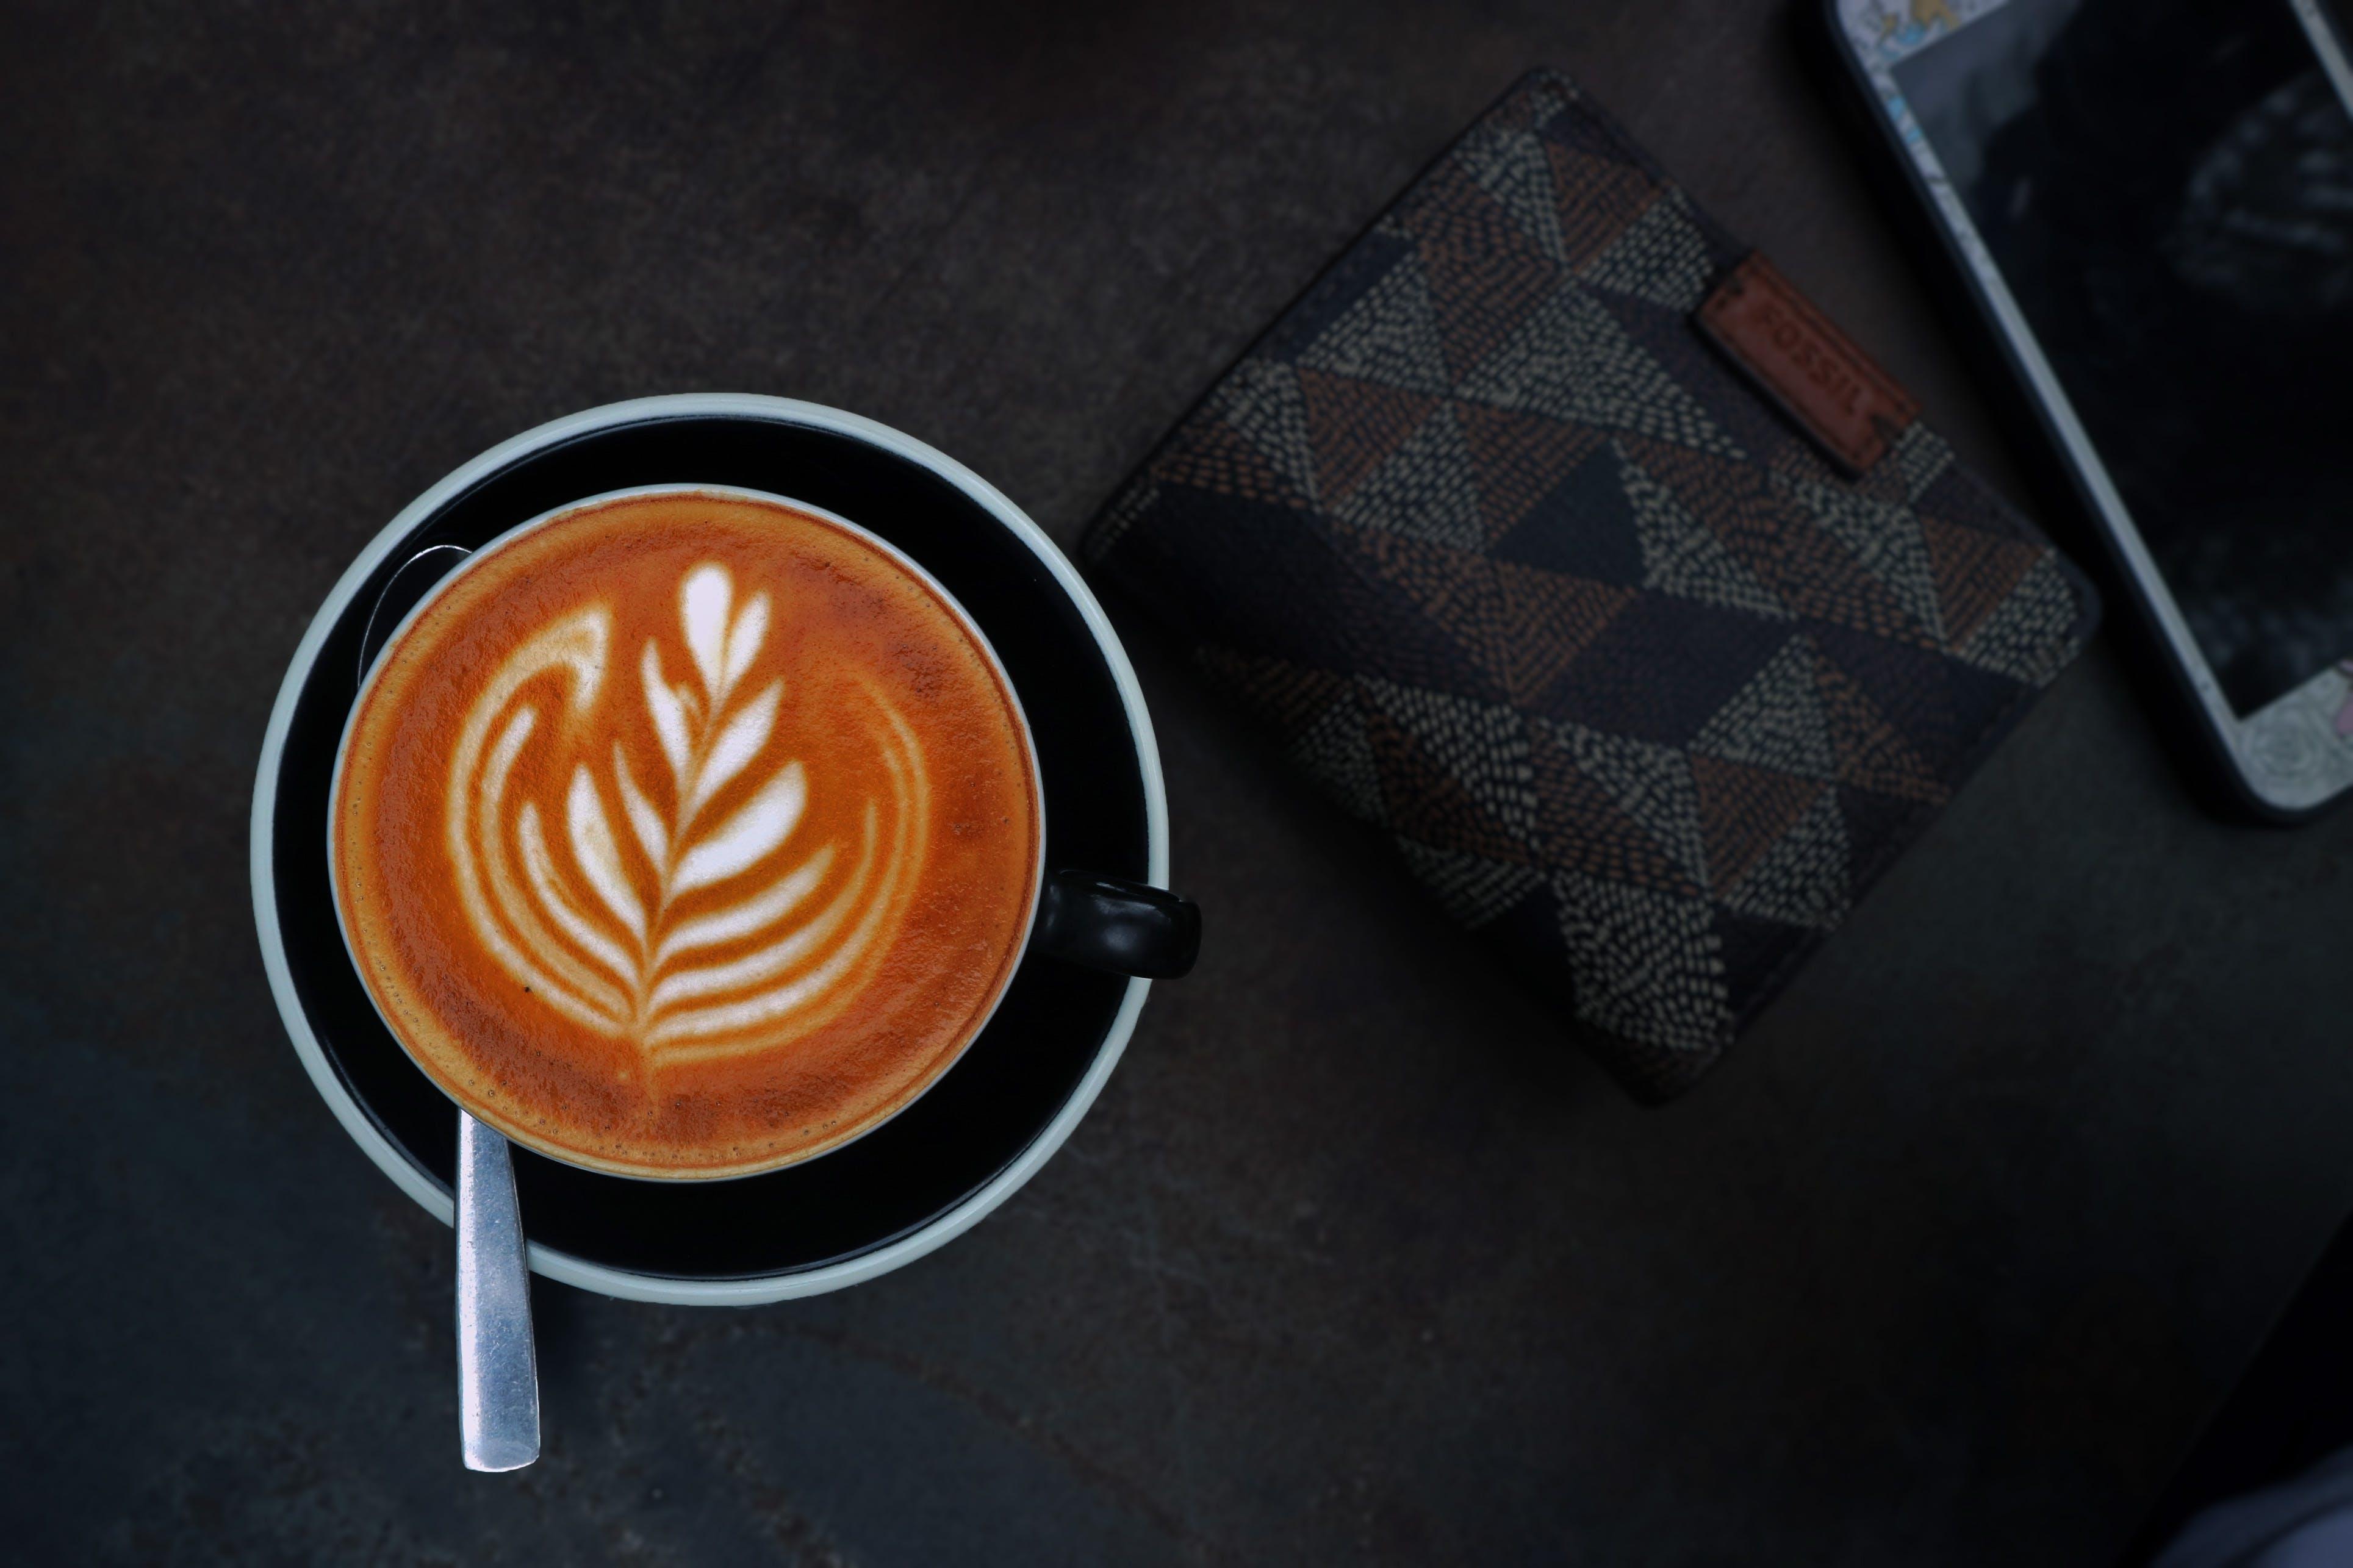 becher, brieftasche, cappuccino